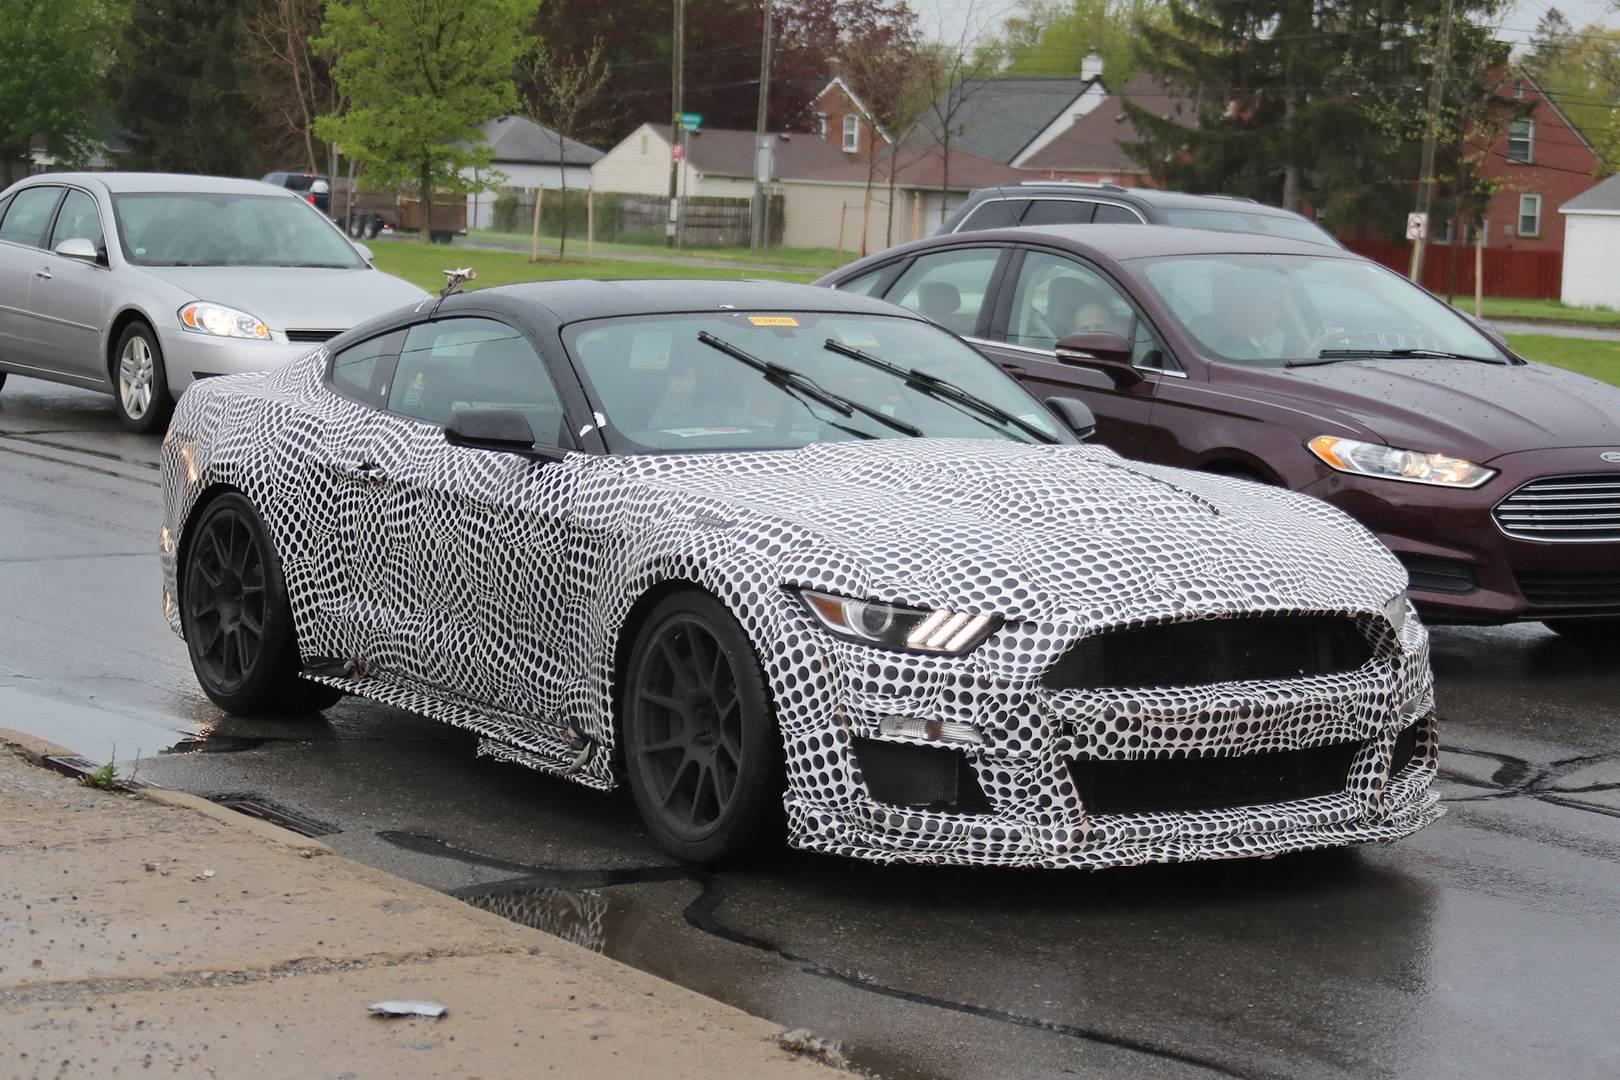 2019 Ford Mustang Shelby Gt500 Spy Shots Gtspirit